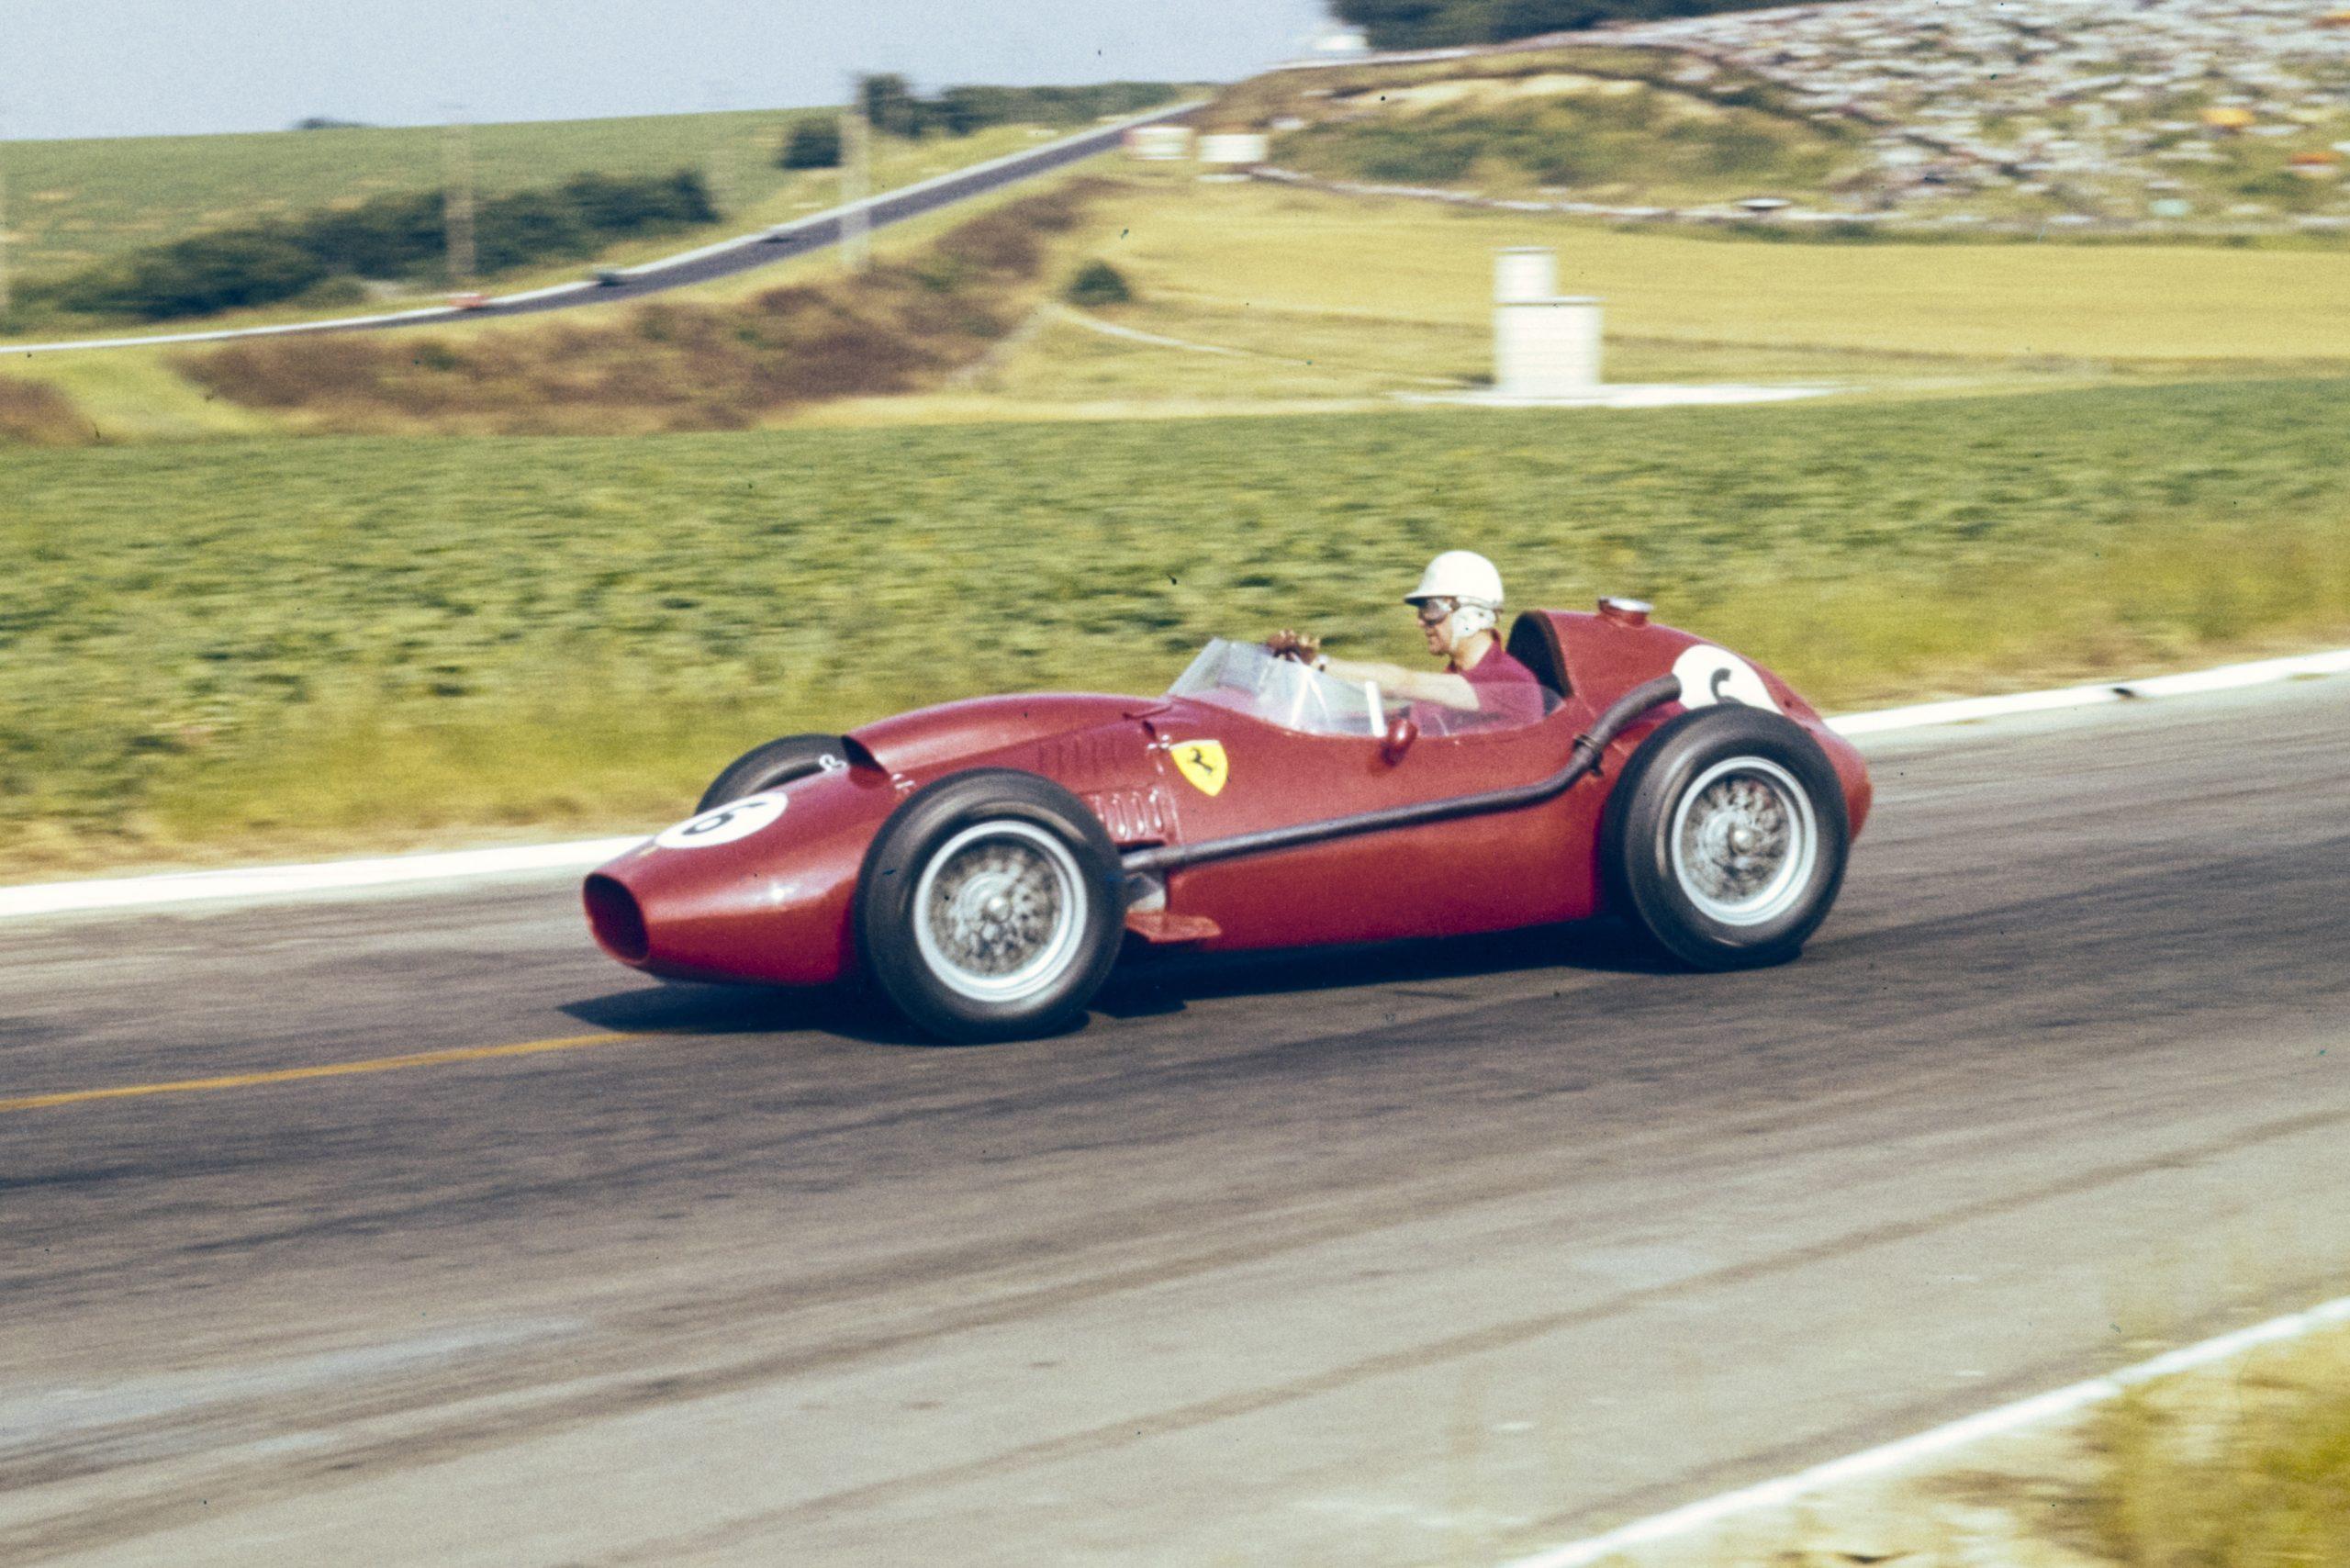 Wolfgang von Trips pilots his Ferrari 246.